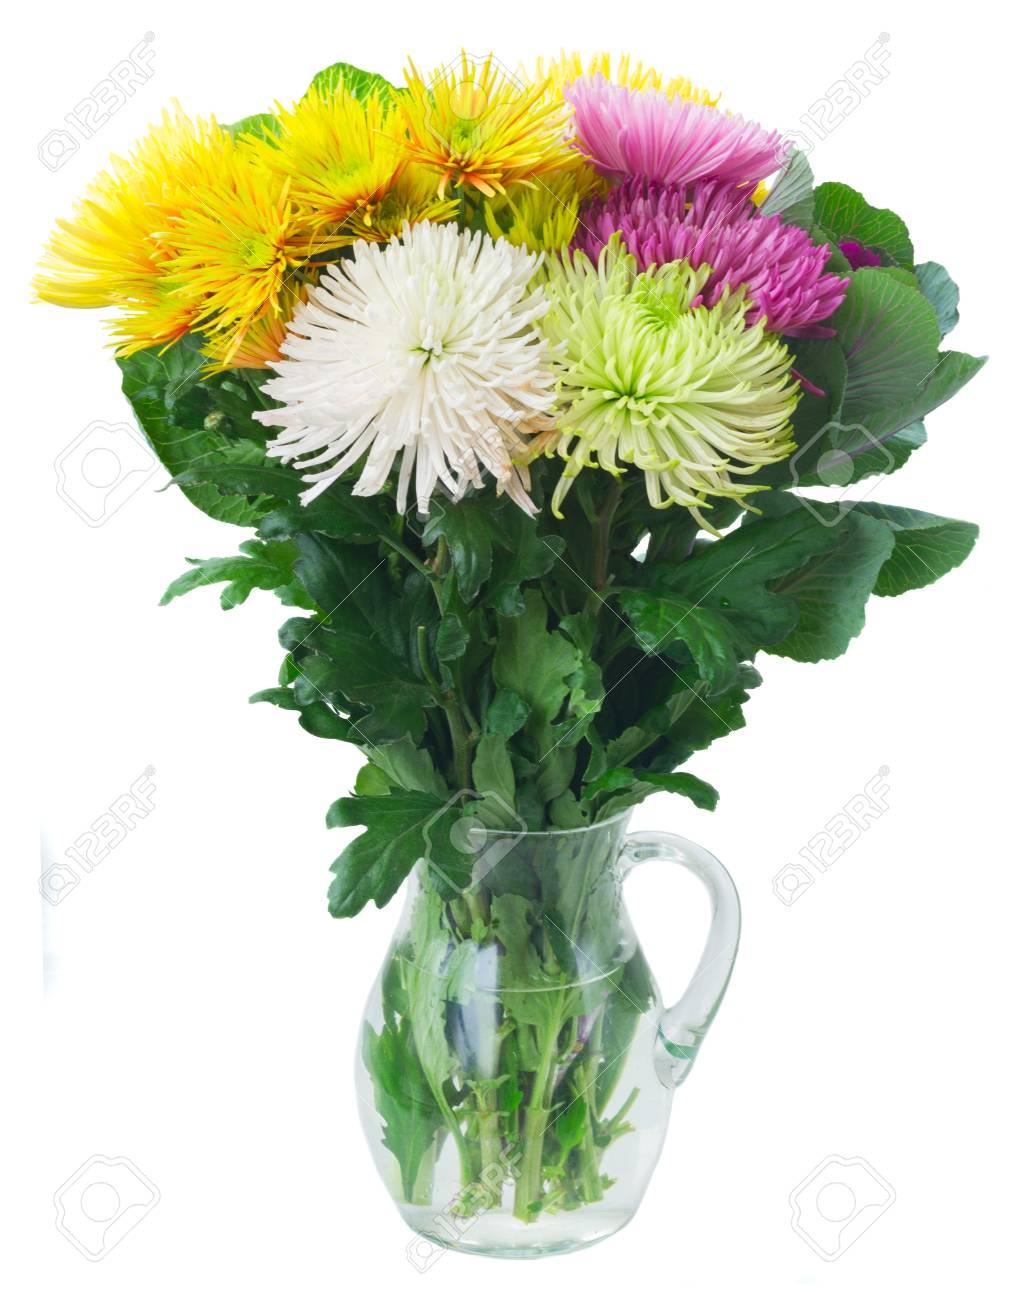 Chrisantemum fresh fall flowers bouquet in vase isolated on white chrisantemum fresh fall flowers bouquet in vase isolated on white background stock photo 85321581 mightylinksfo